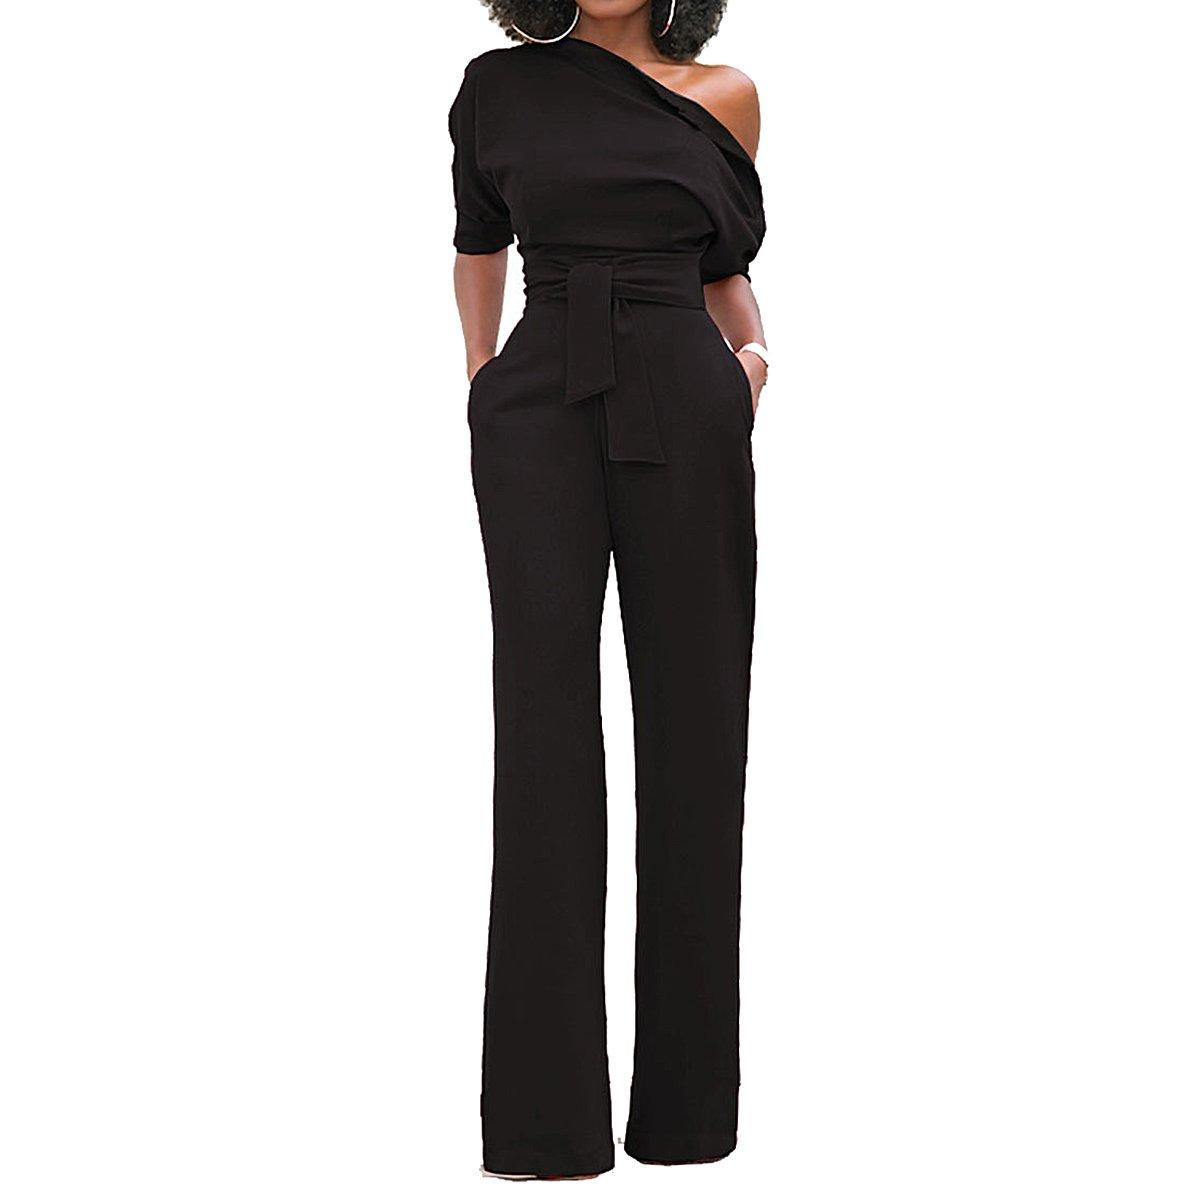 CZ - Tailleur pantalone - Donna CZ41575